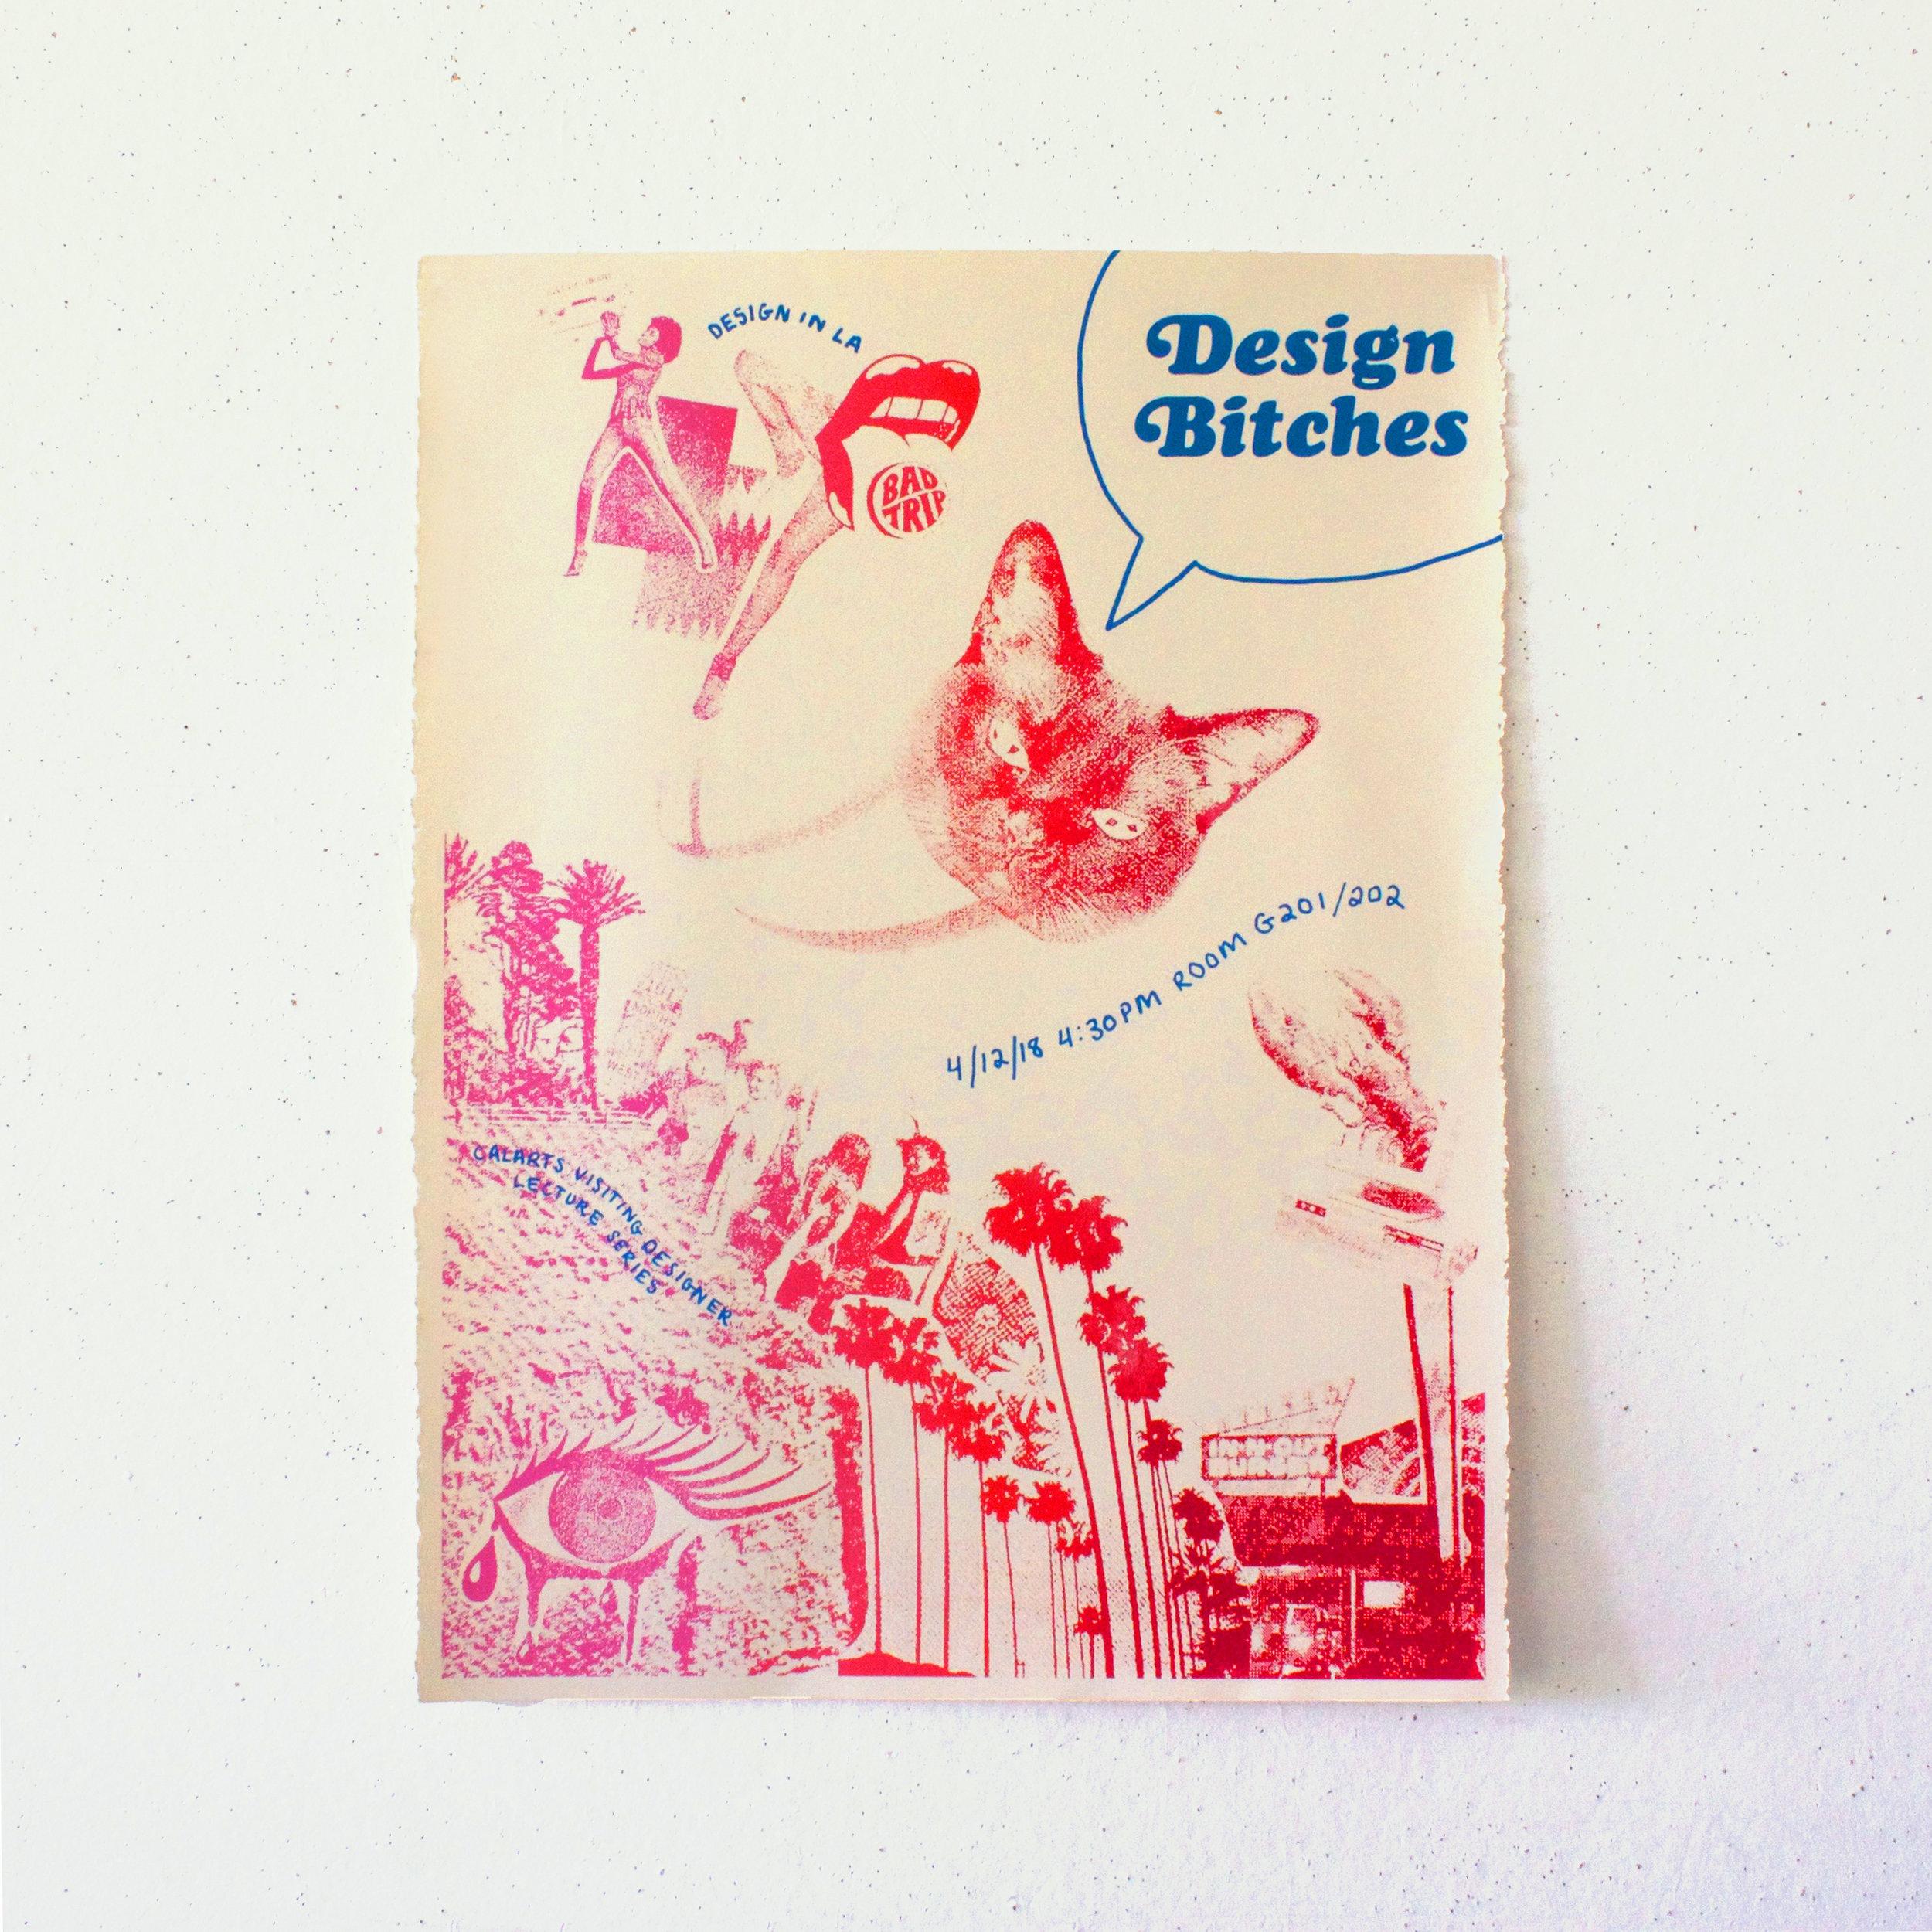 designbitches-01-sat.jpg